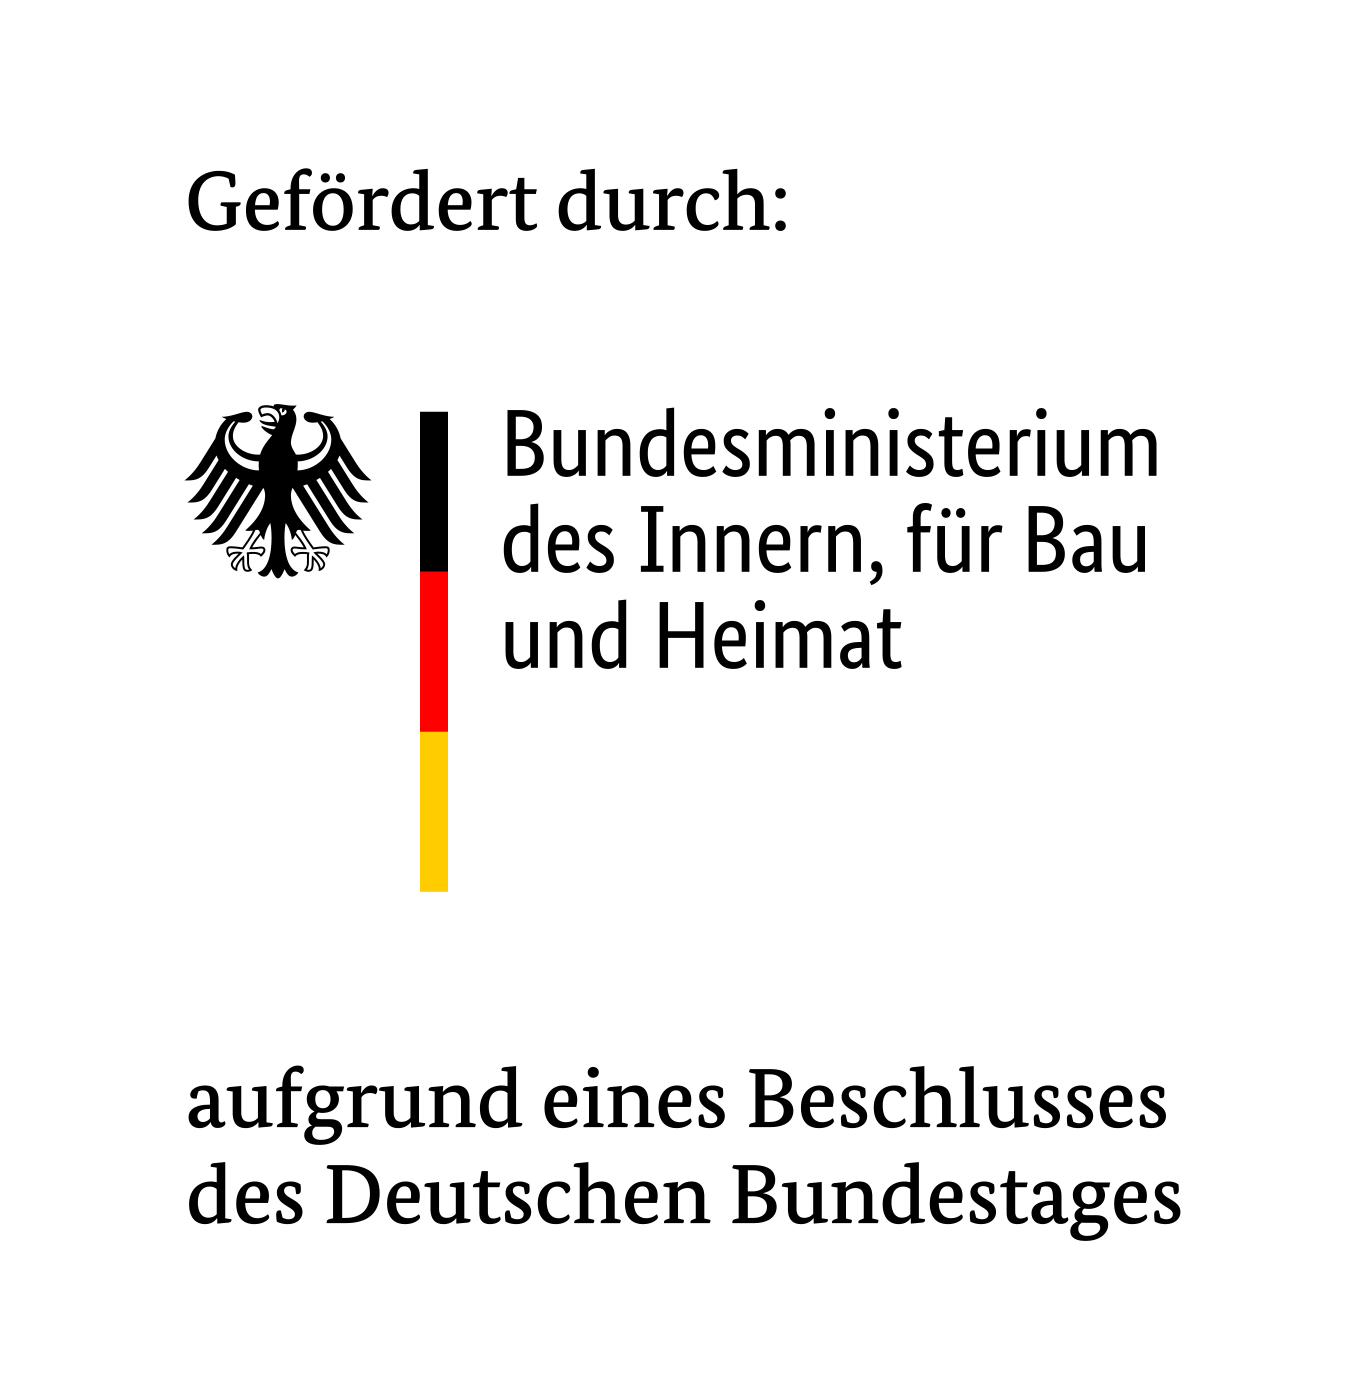 https://www.formatwechsel-berlin.de/wp-content/uploads/2018/02/127877_Foerderlogo_BMI_deutsch_farbig_png__Print_1.png